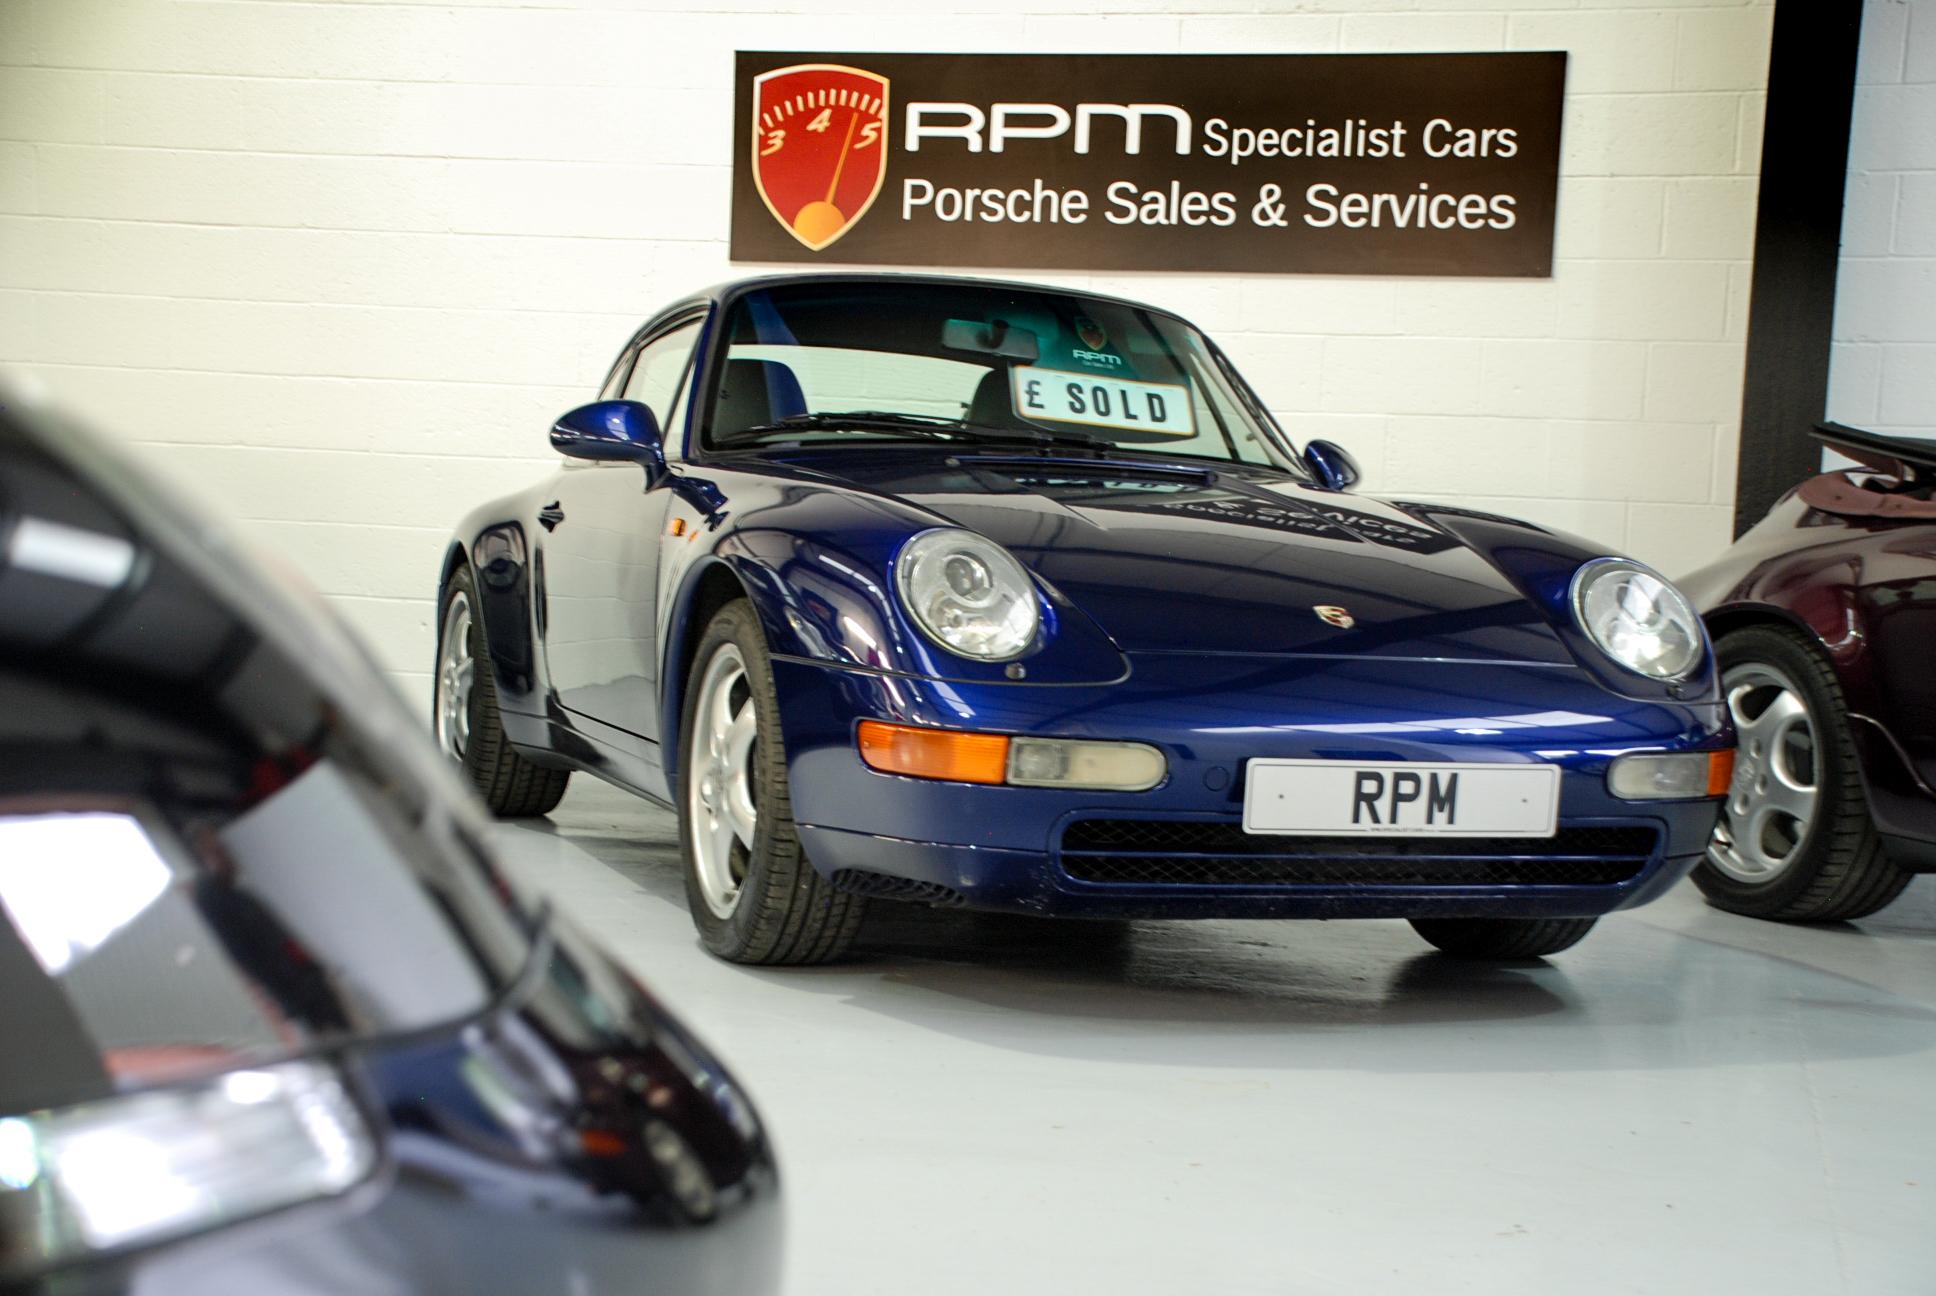 Porsche Dealership Harrogate